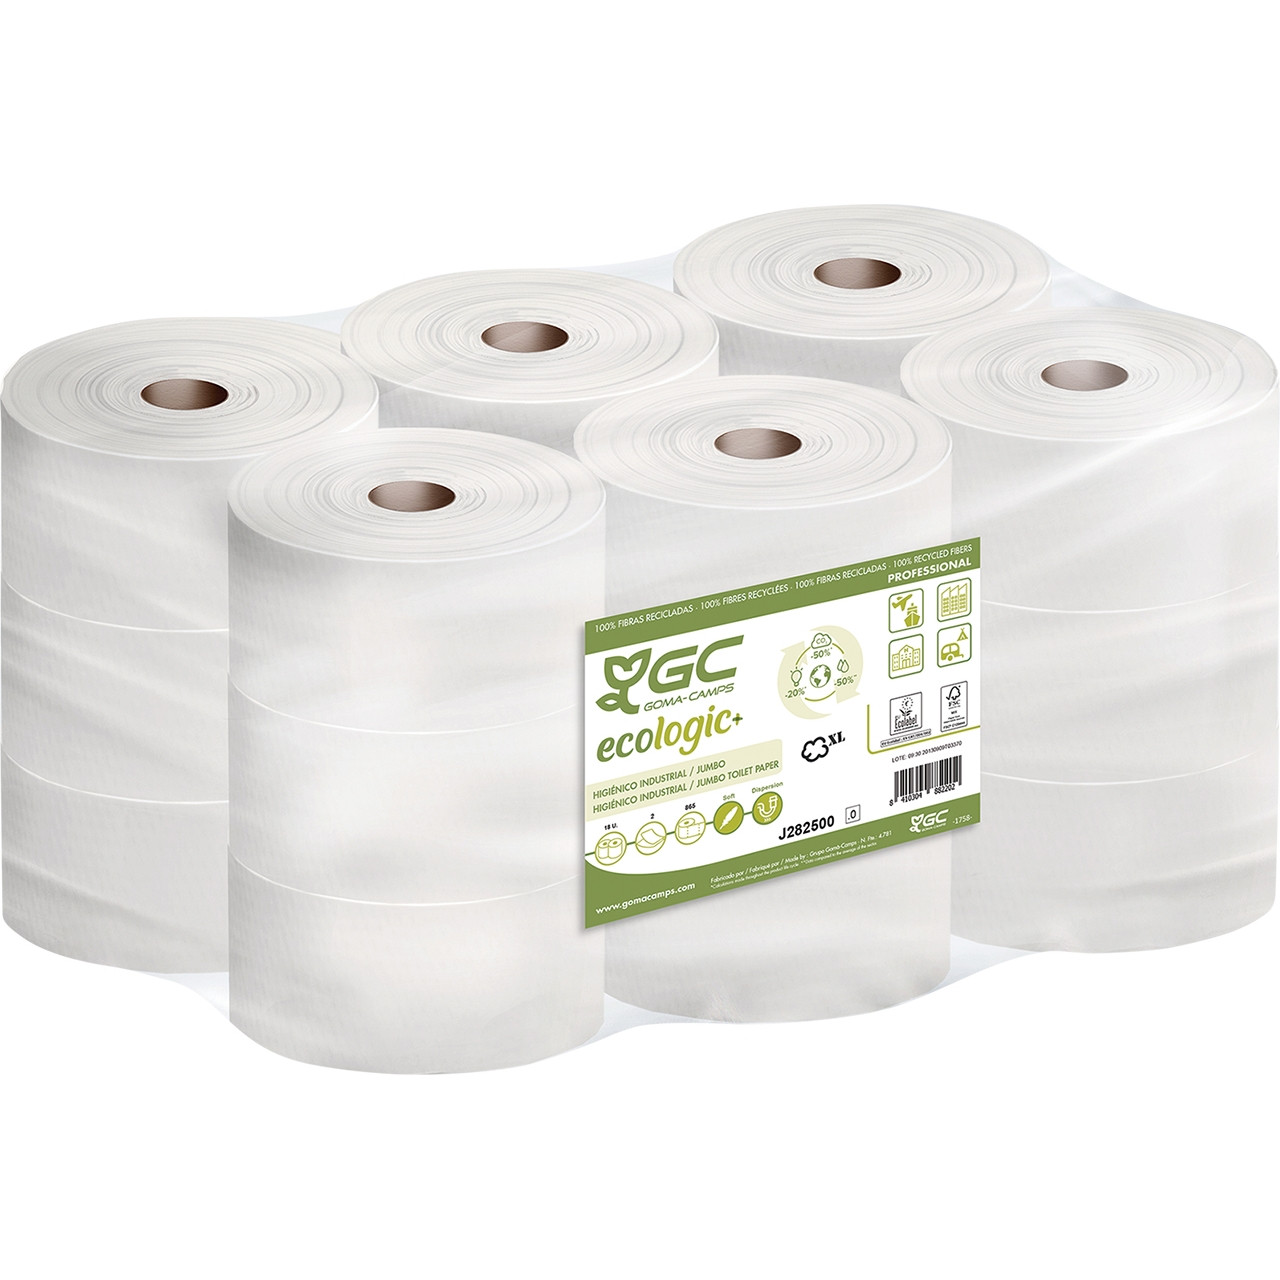 Higienic jumbo 2c.bl.gc eco (865 serveis)